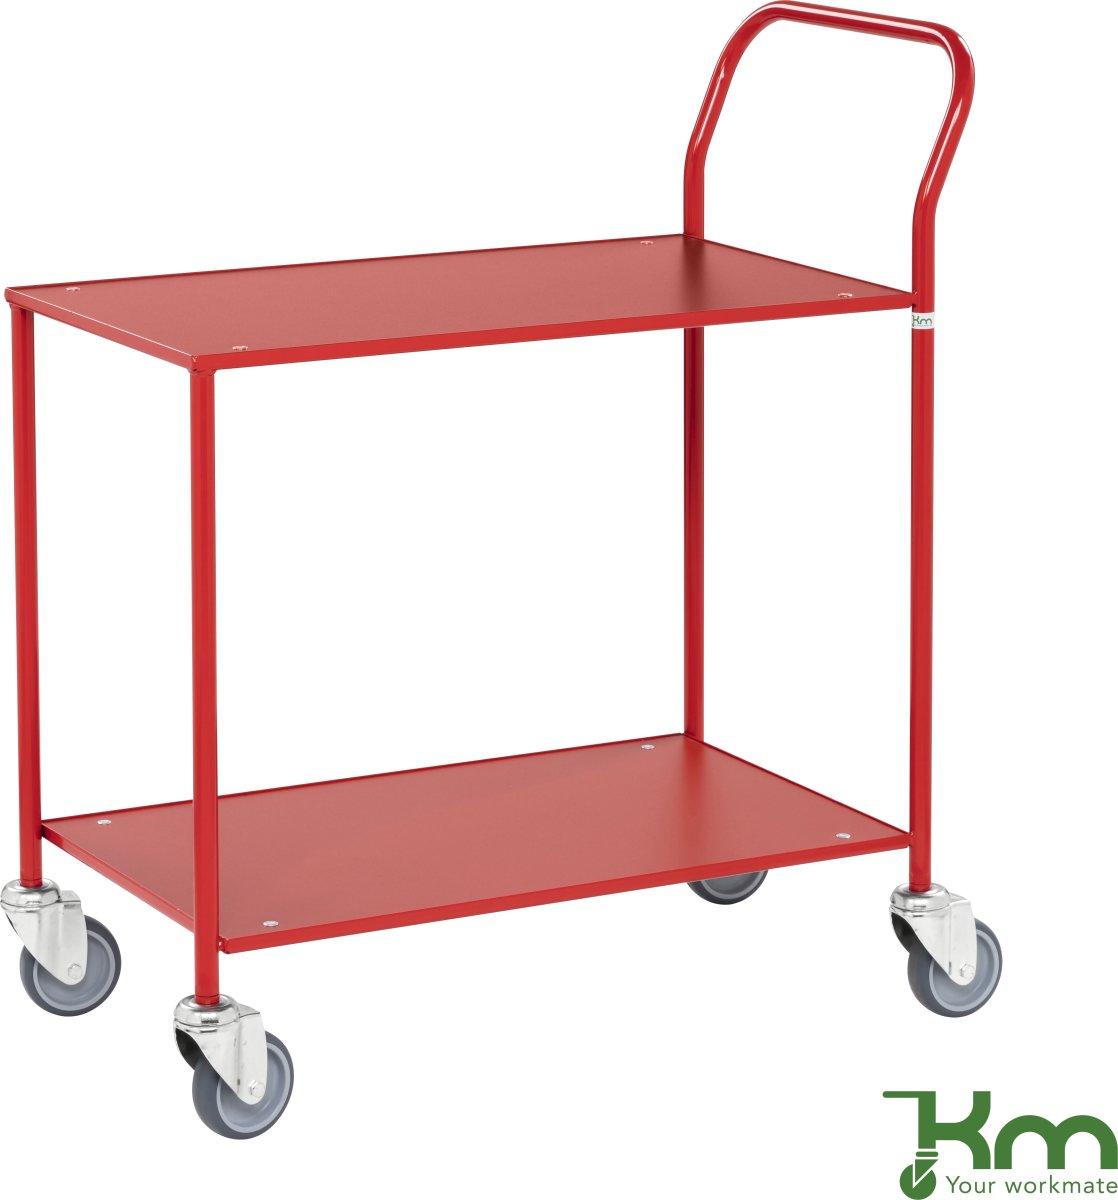 Rullebord - 2 hylder, 840x430x970, Rød/Rød